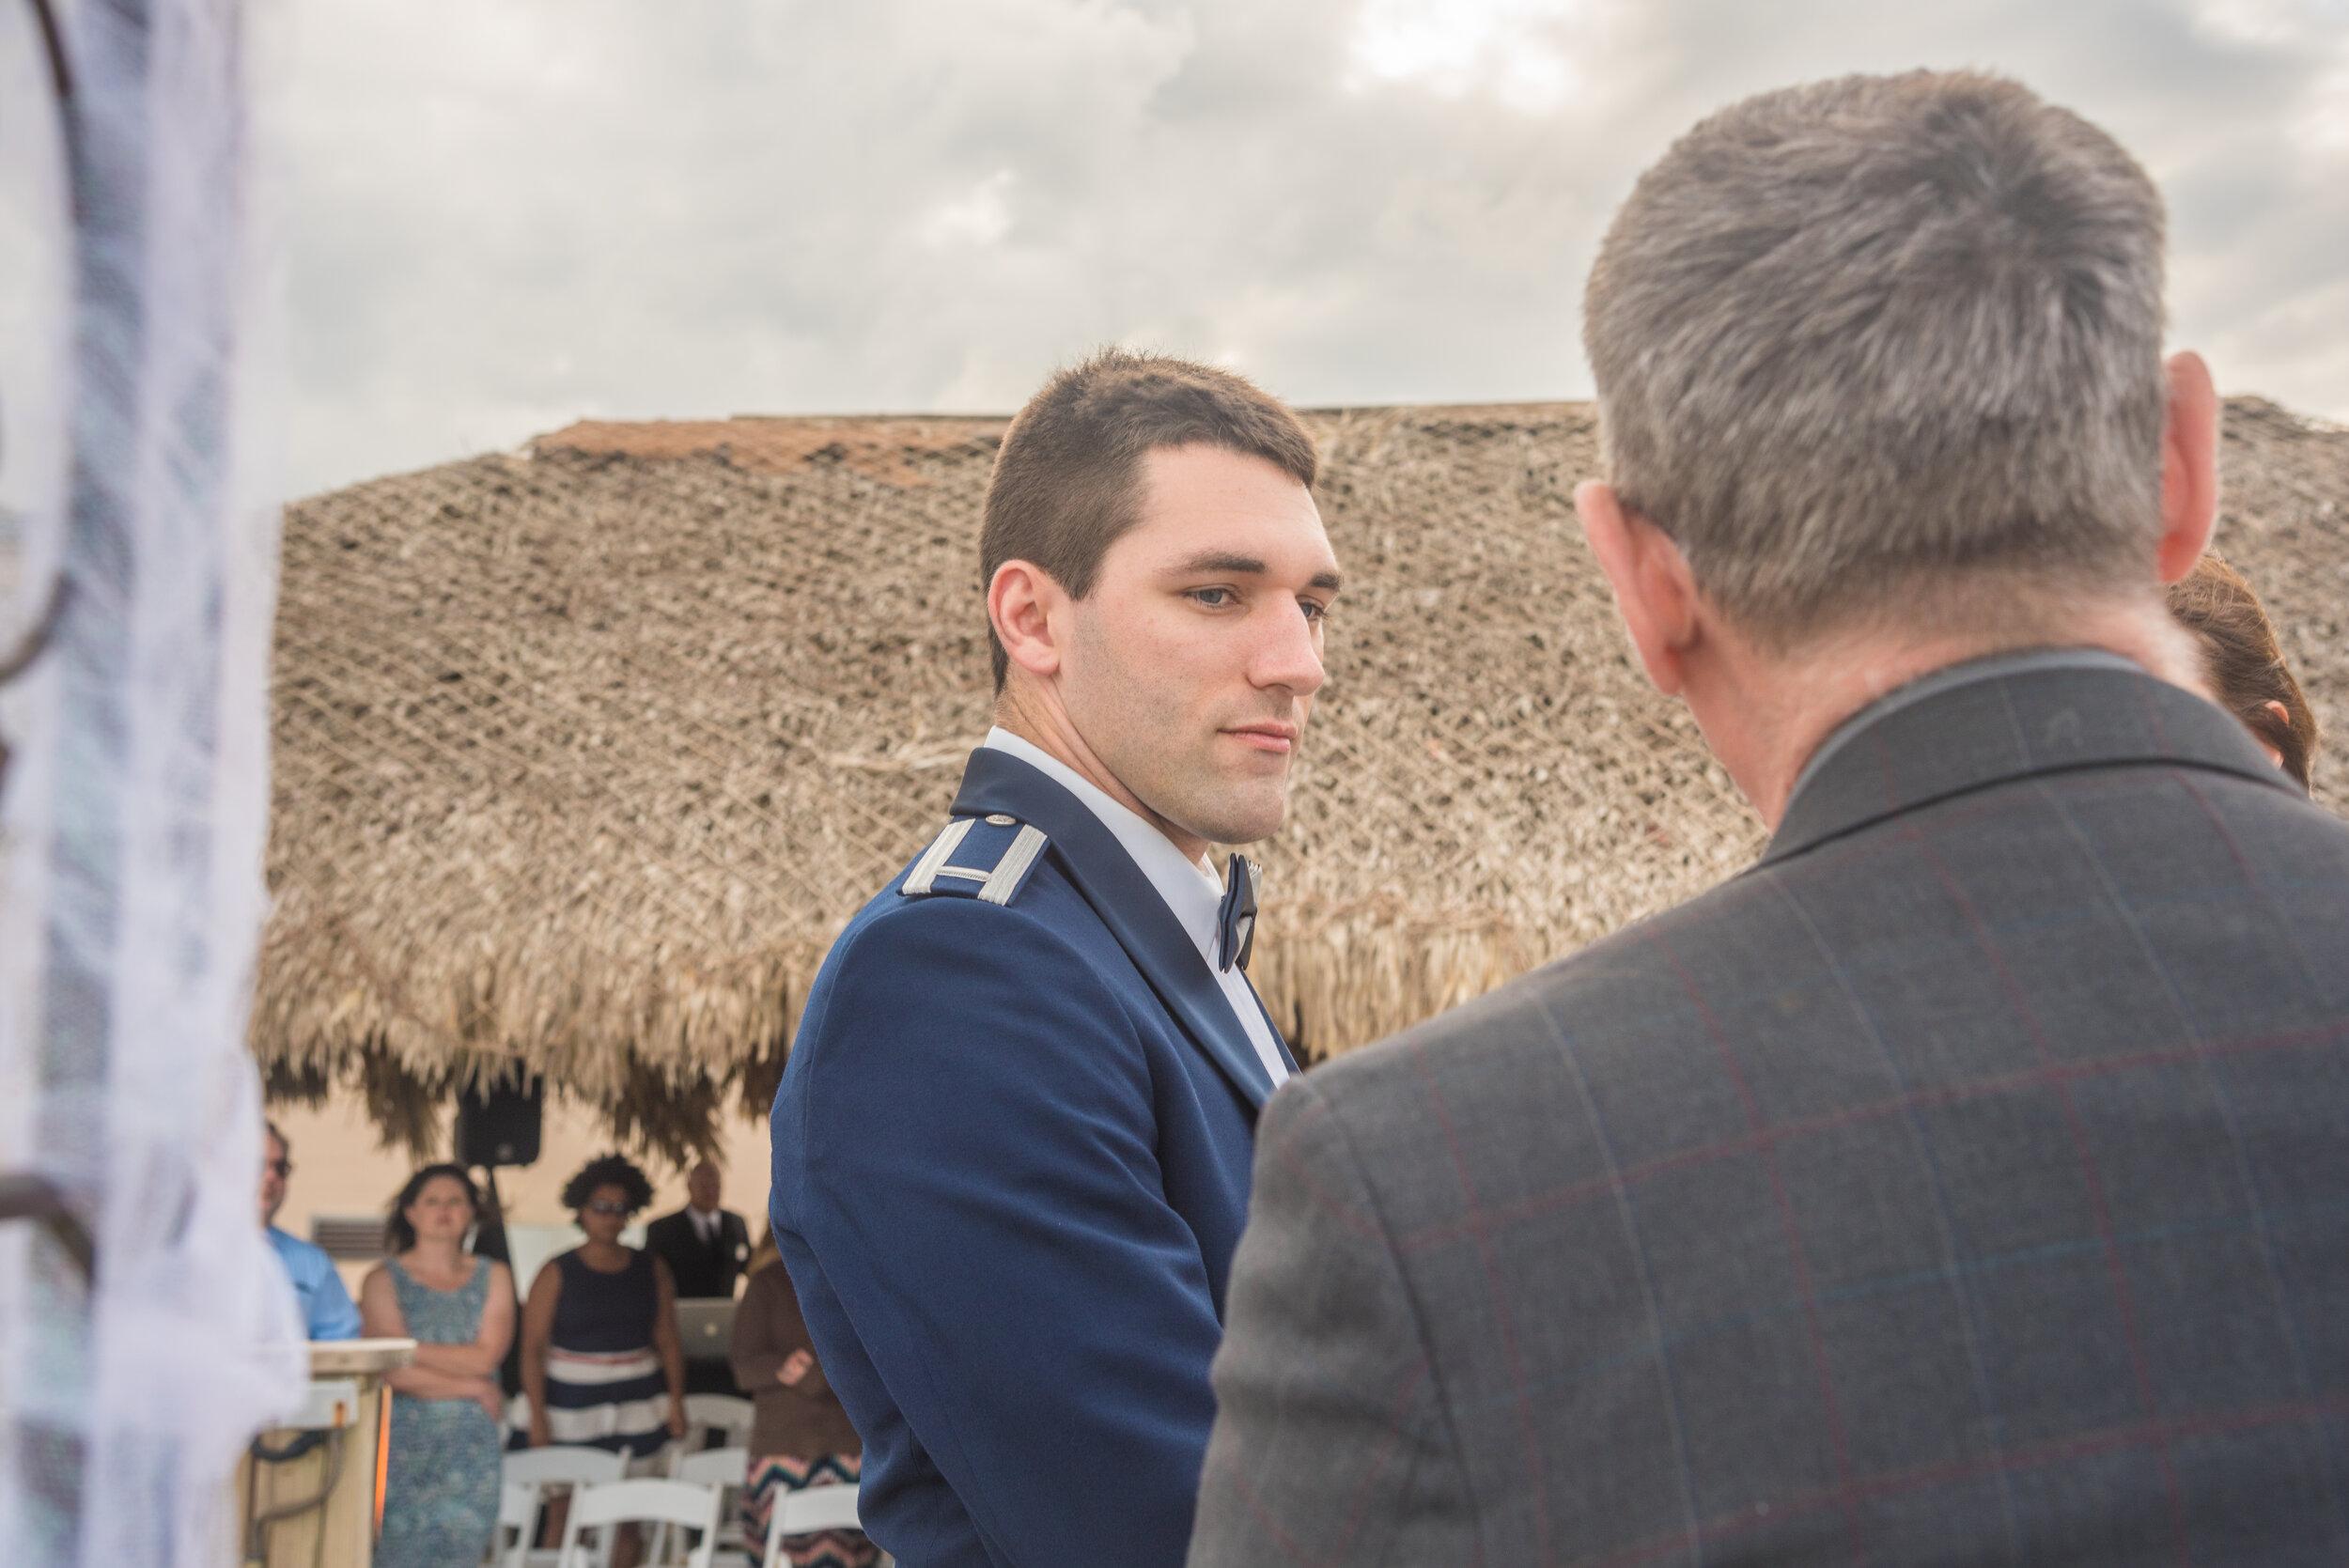 andru-the-tide-club-air-force-wedding-patrickafb-1-36.jpg